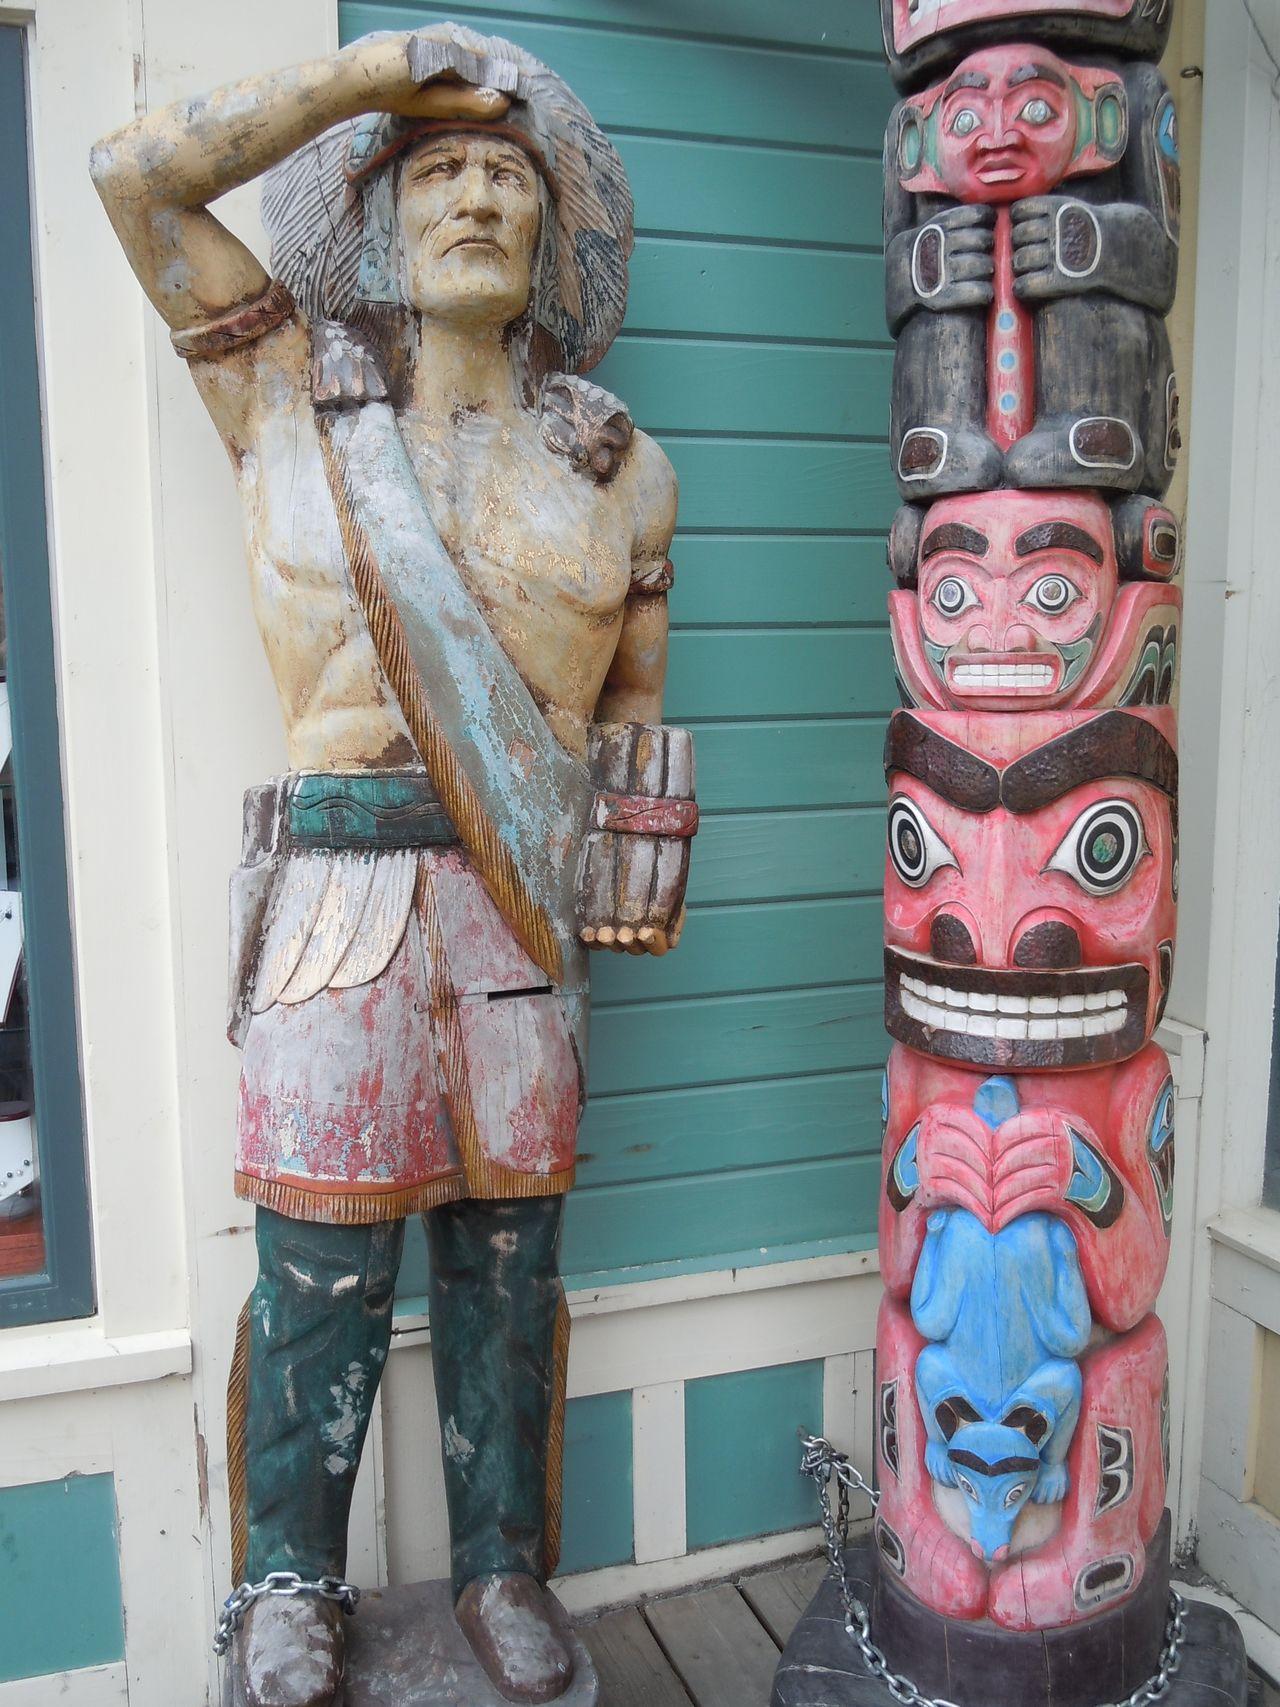 Totems in Alaska Alaska Carving - Craft Product Sculpture Statue Totem Totems Wooden Indian